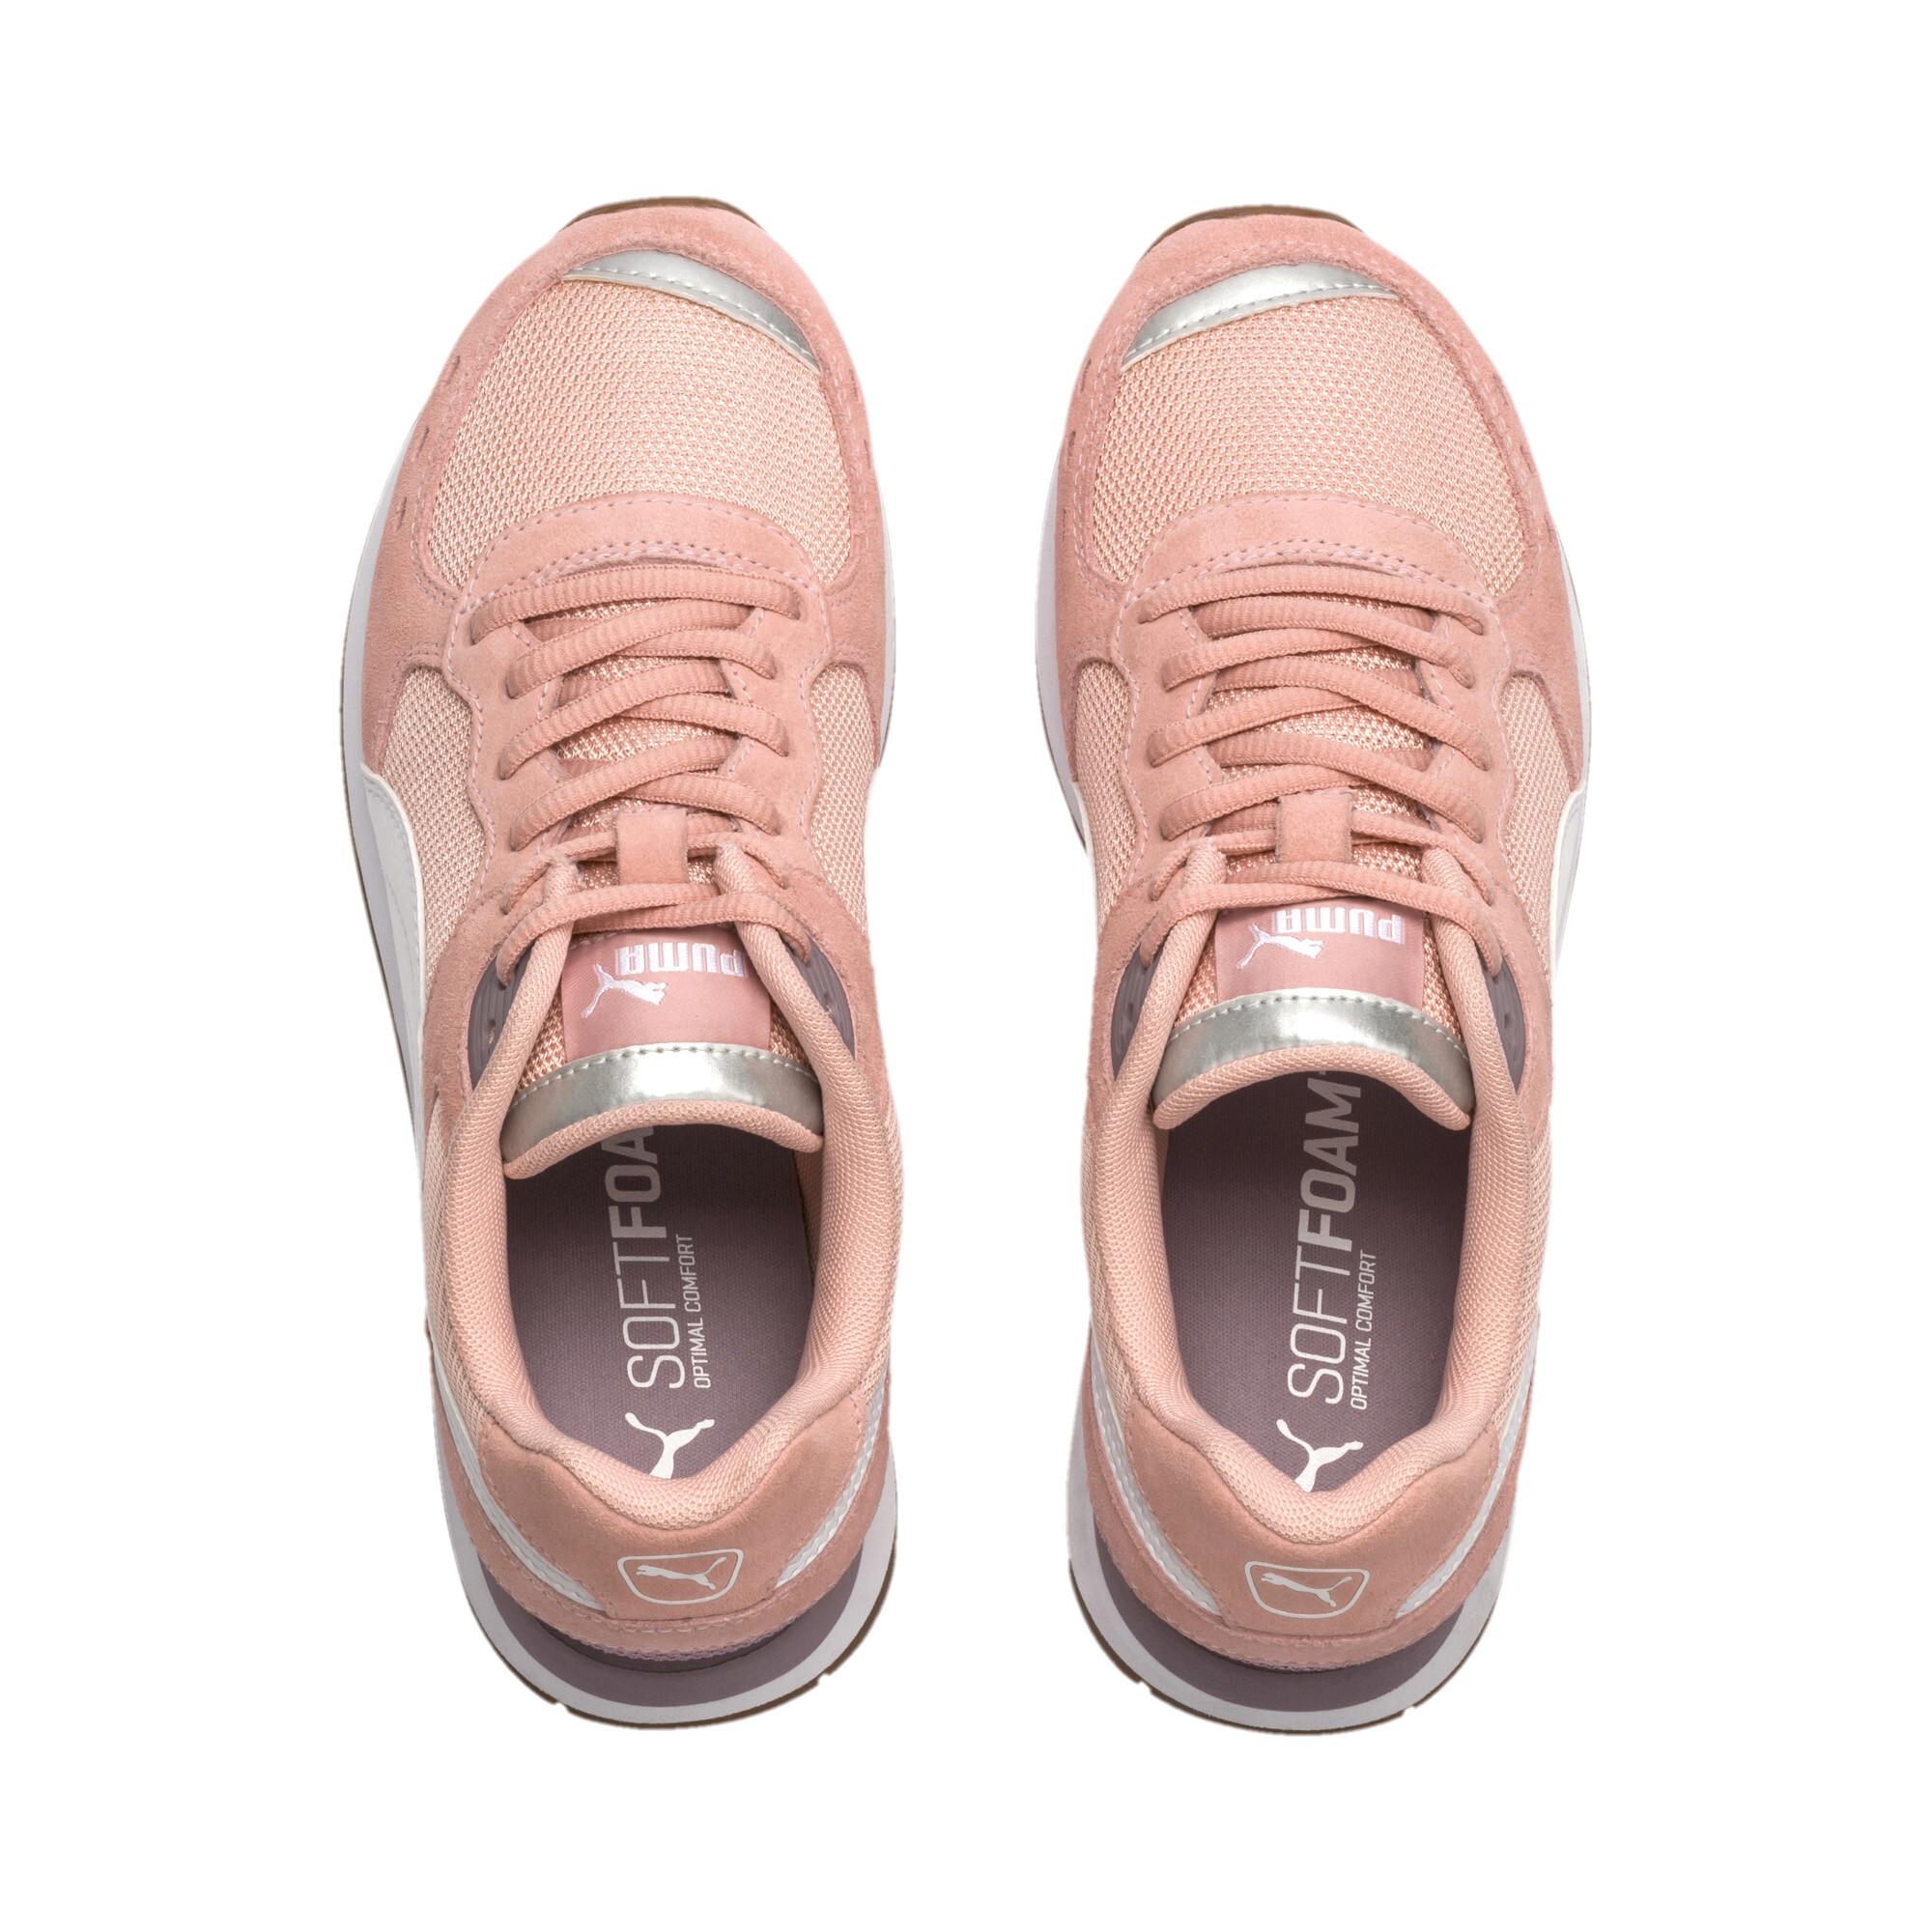 PUMA-Vista-Women-s-Sneakers-Women-Shoe-Basics thumbnail 17